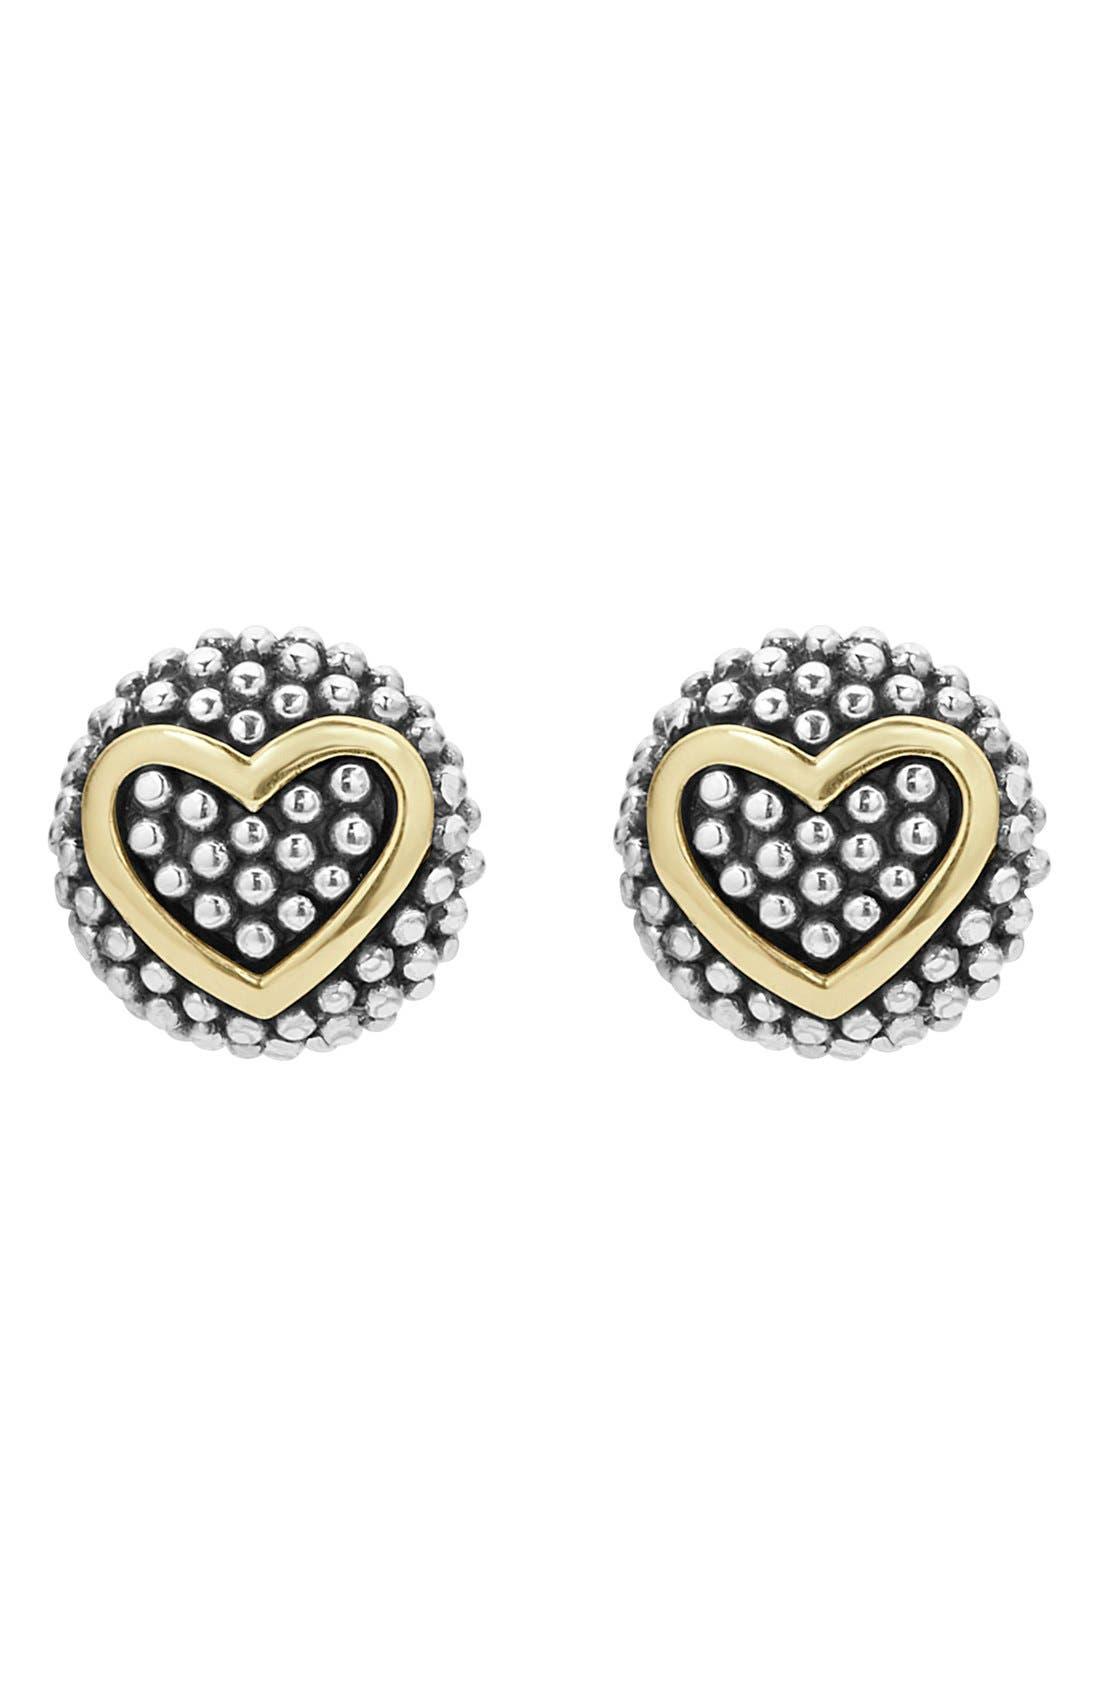 LAGOS Caviar Heart Stud Earrings